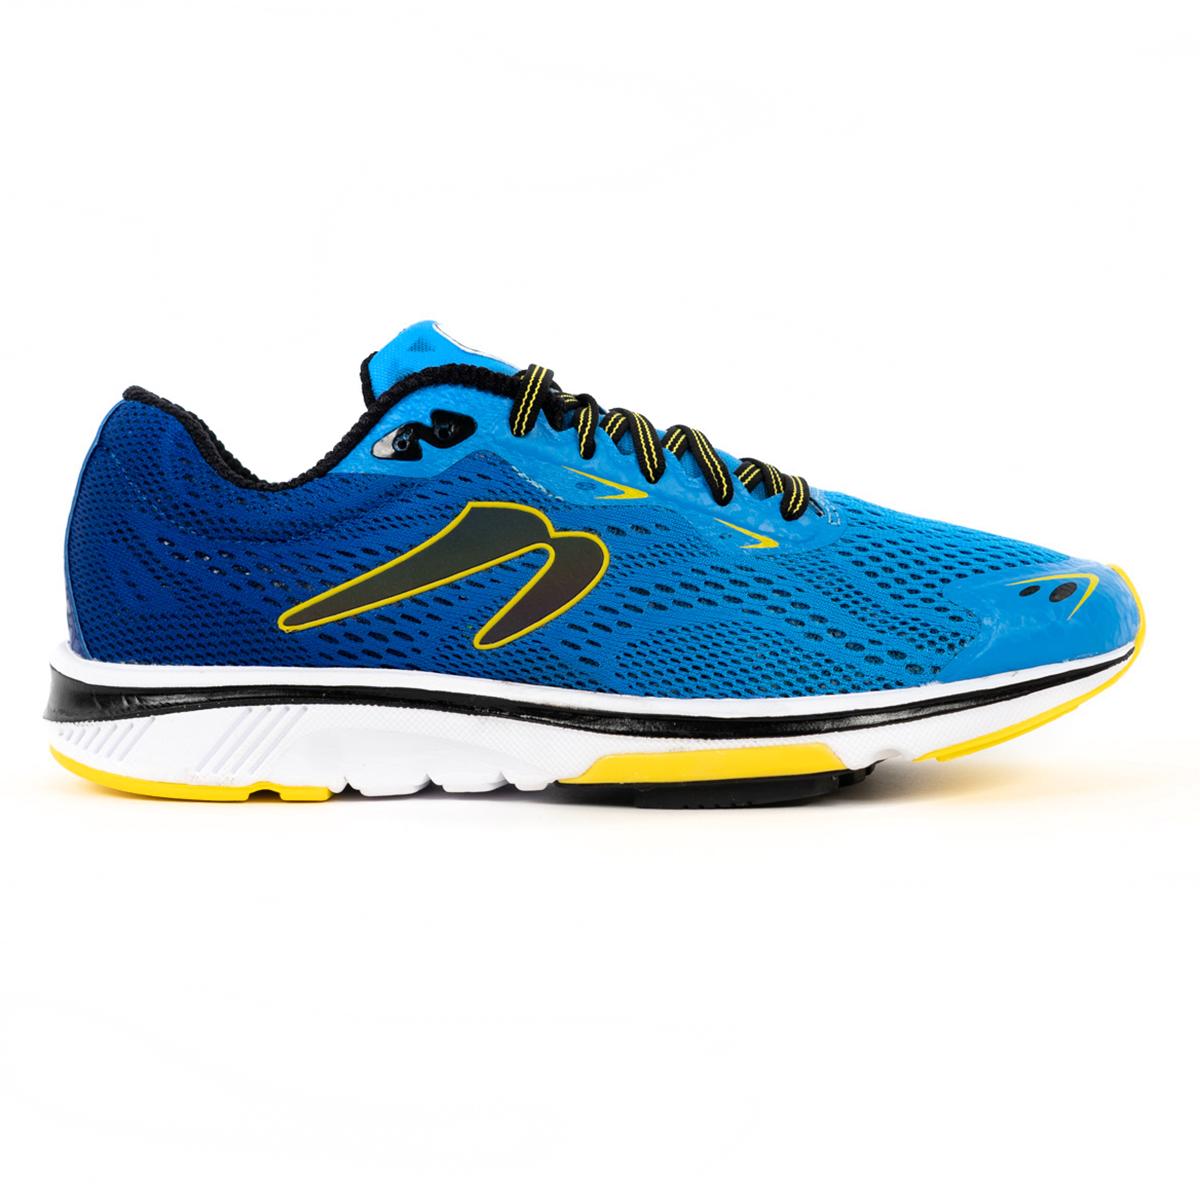 Men's Newton Gravity 9 Running Shoe - Color: Navy/Citron (Regular Width) - Size: 6, Navy/Citron, large, image 1